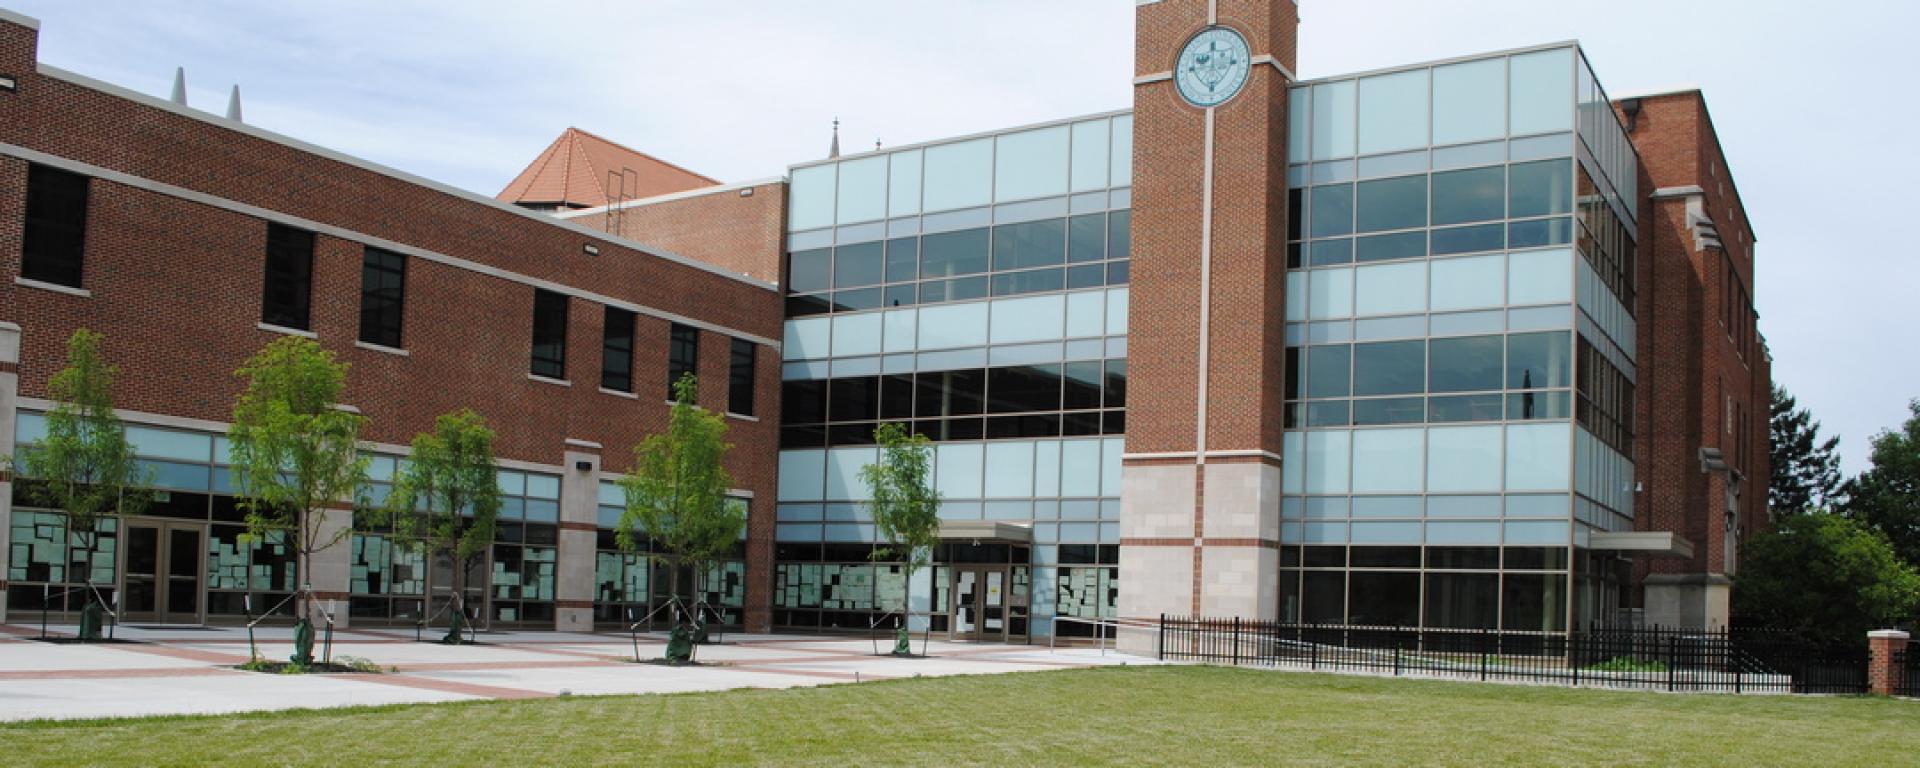 Side view of Covington Latin School